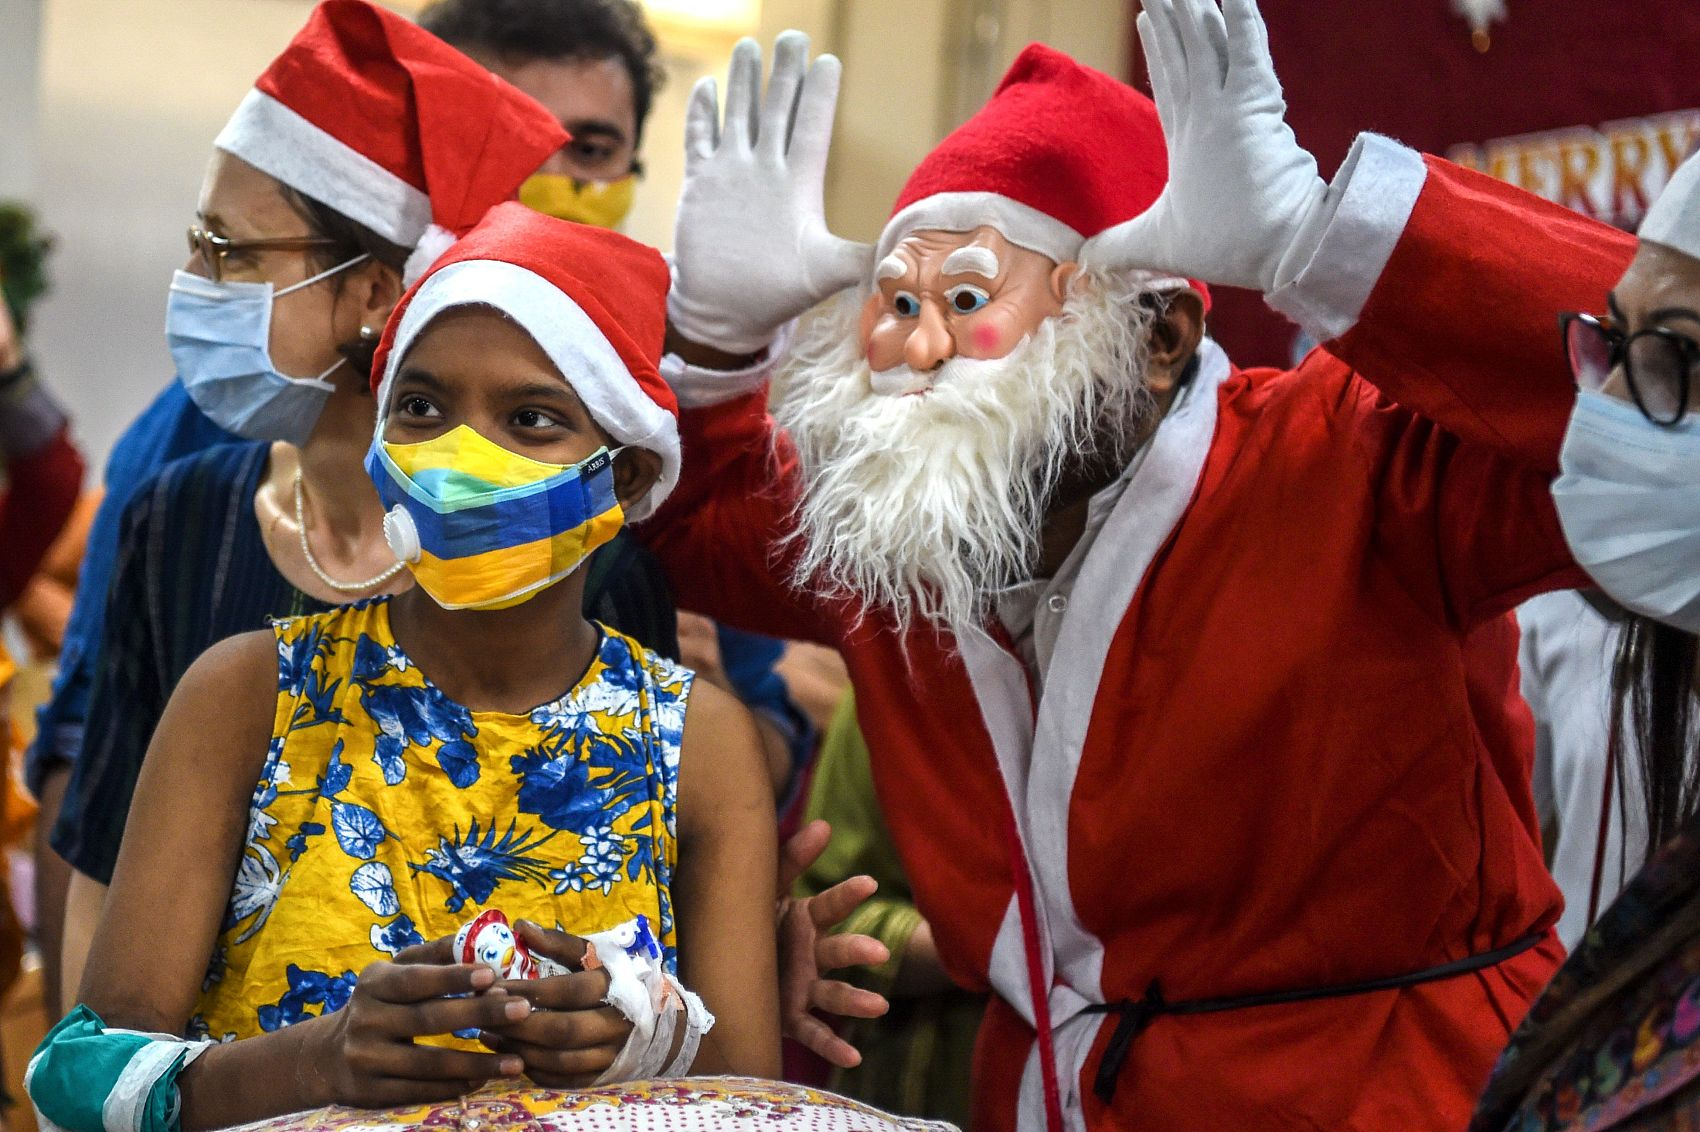 Christmas vibe amid COVID-19